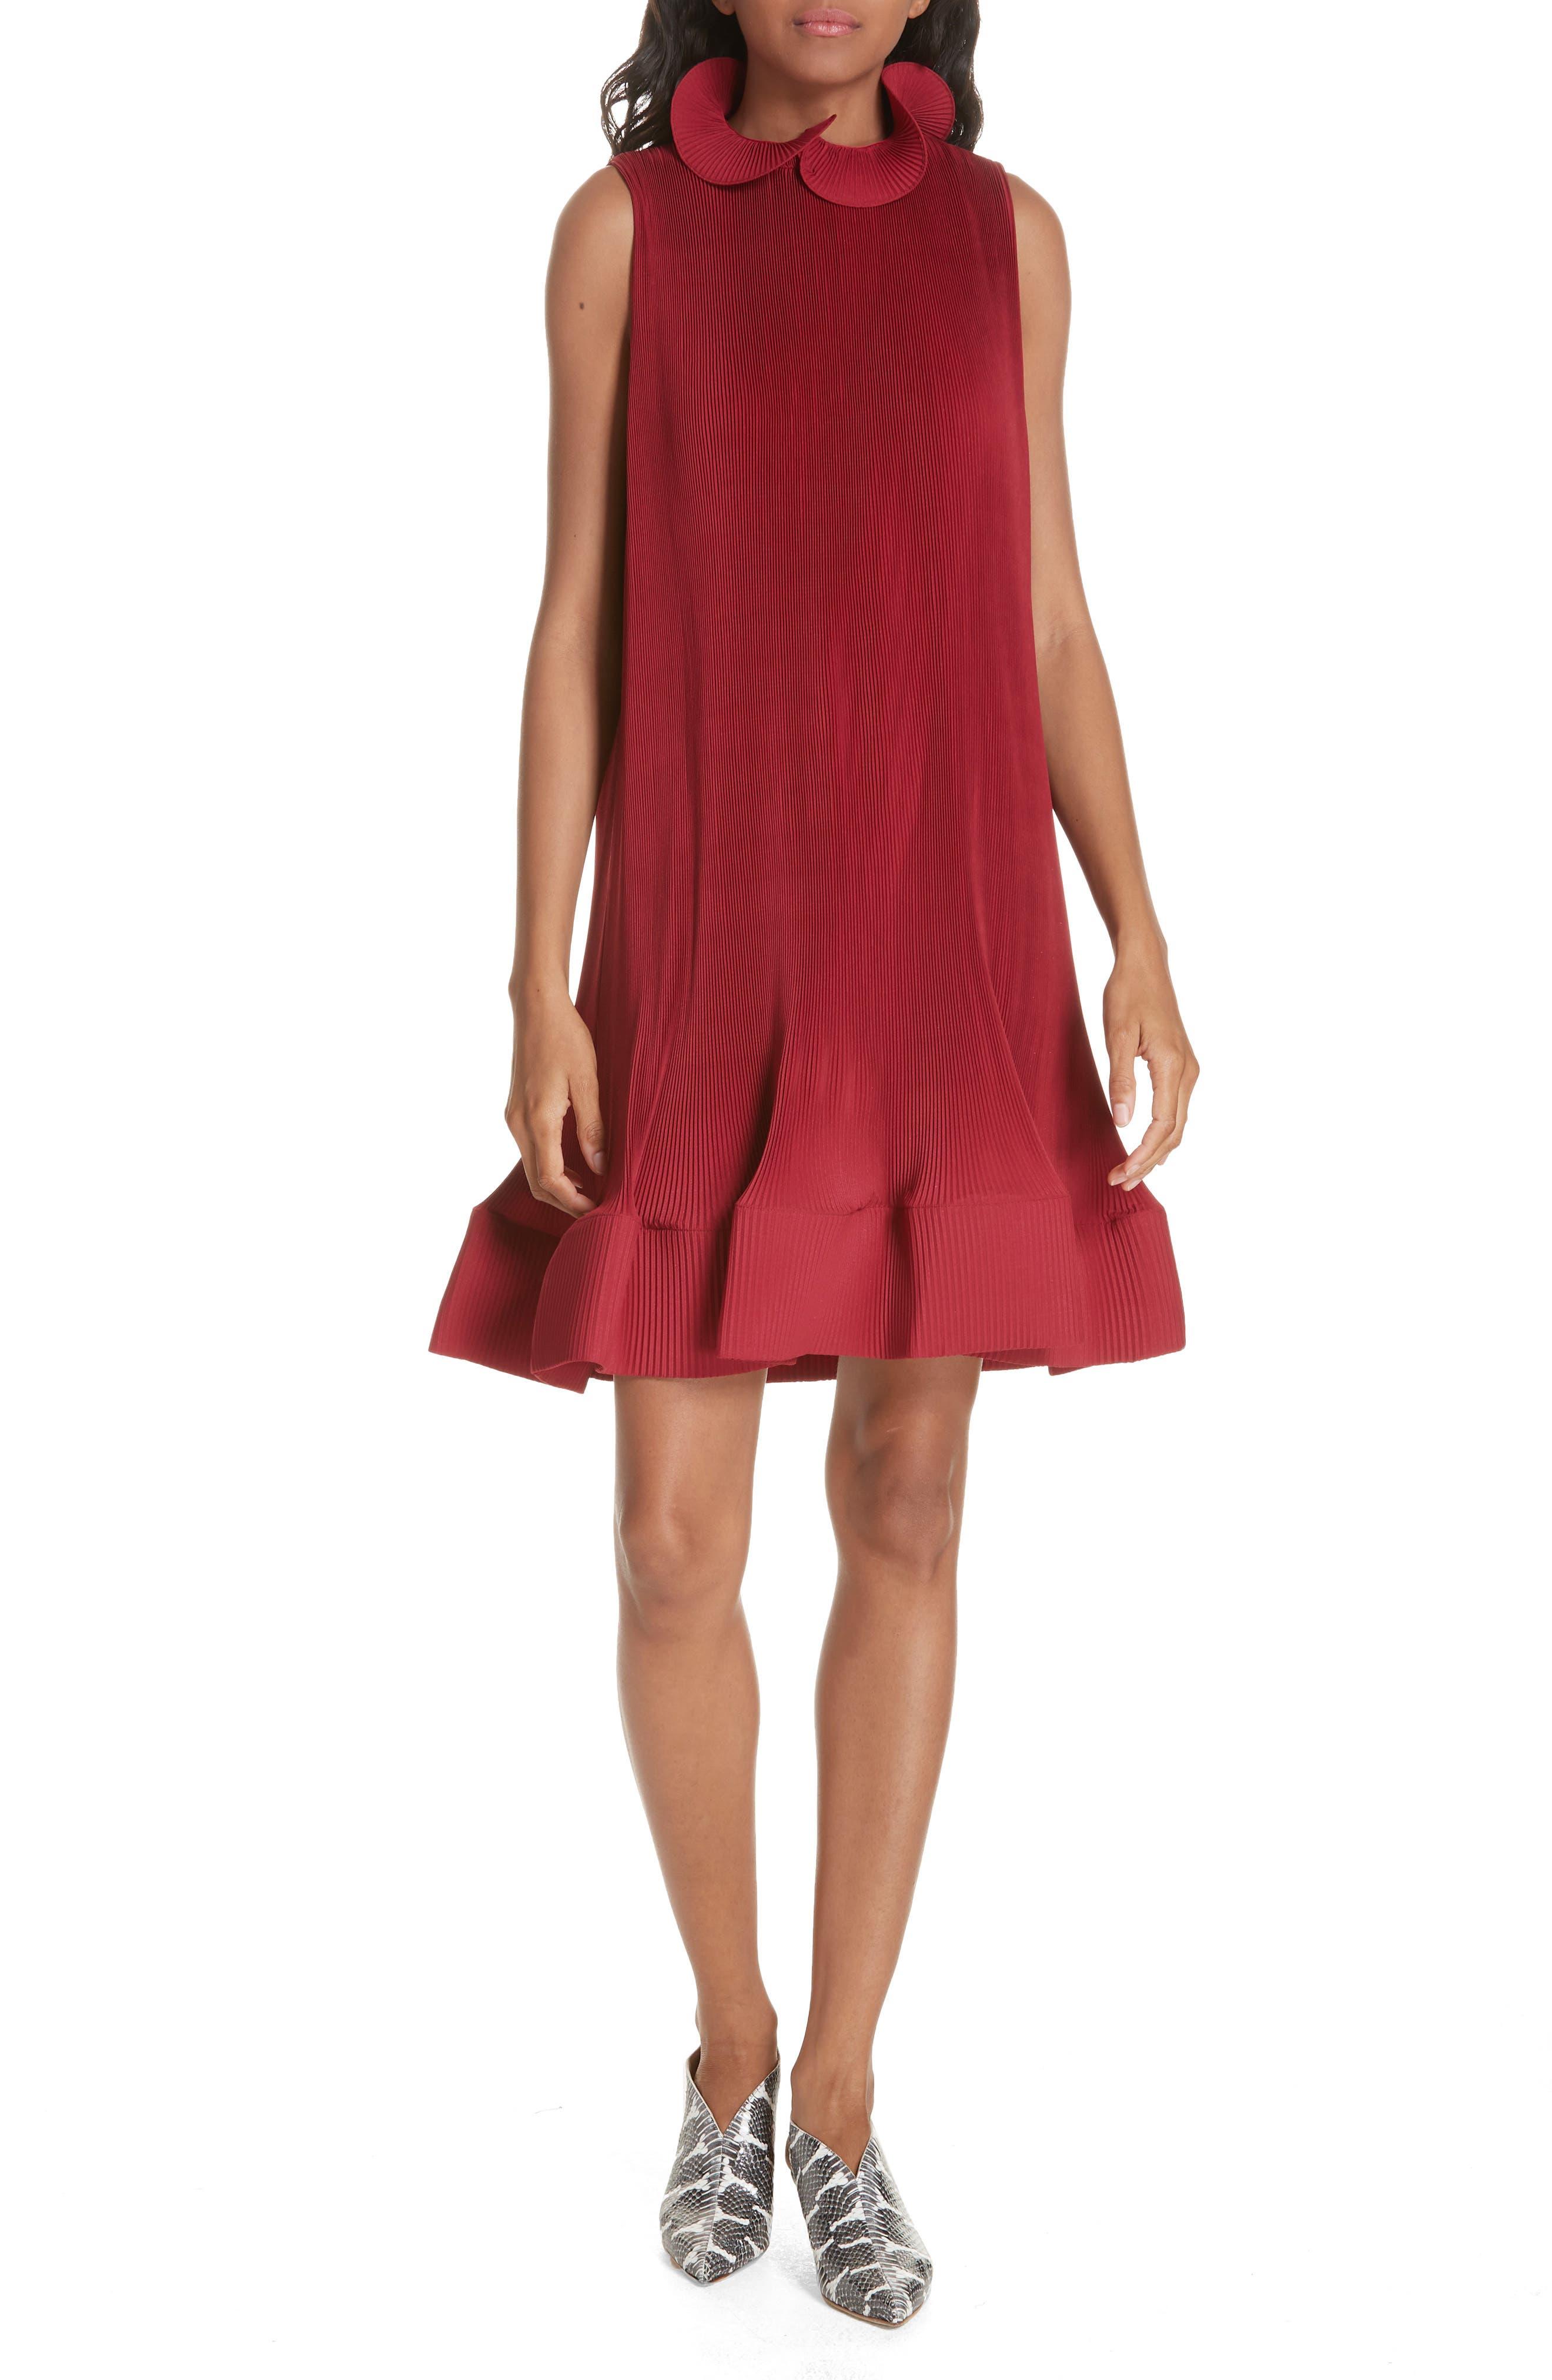 Tibi Pleating Sculptured Sleeveless Dress, Red